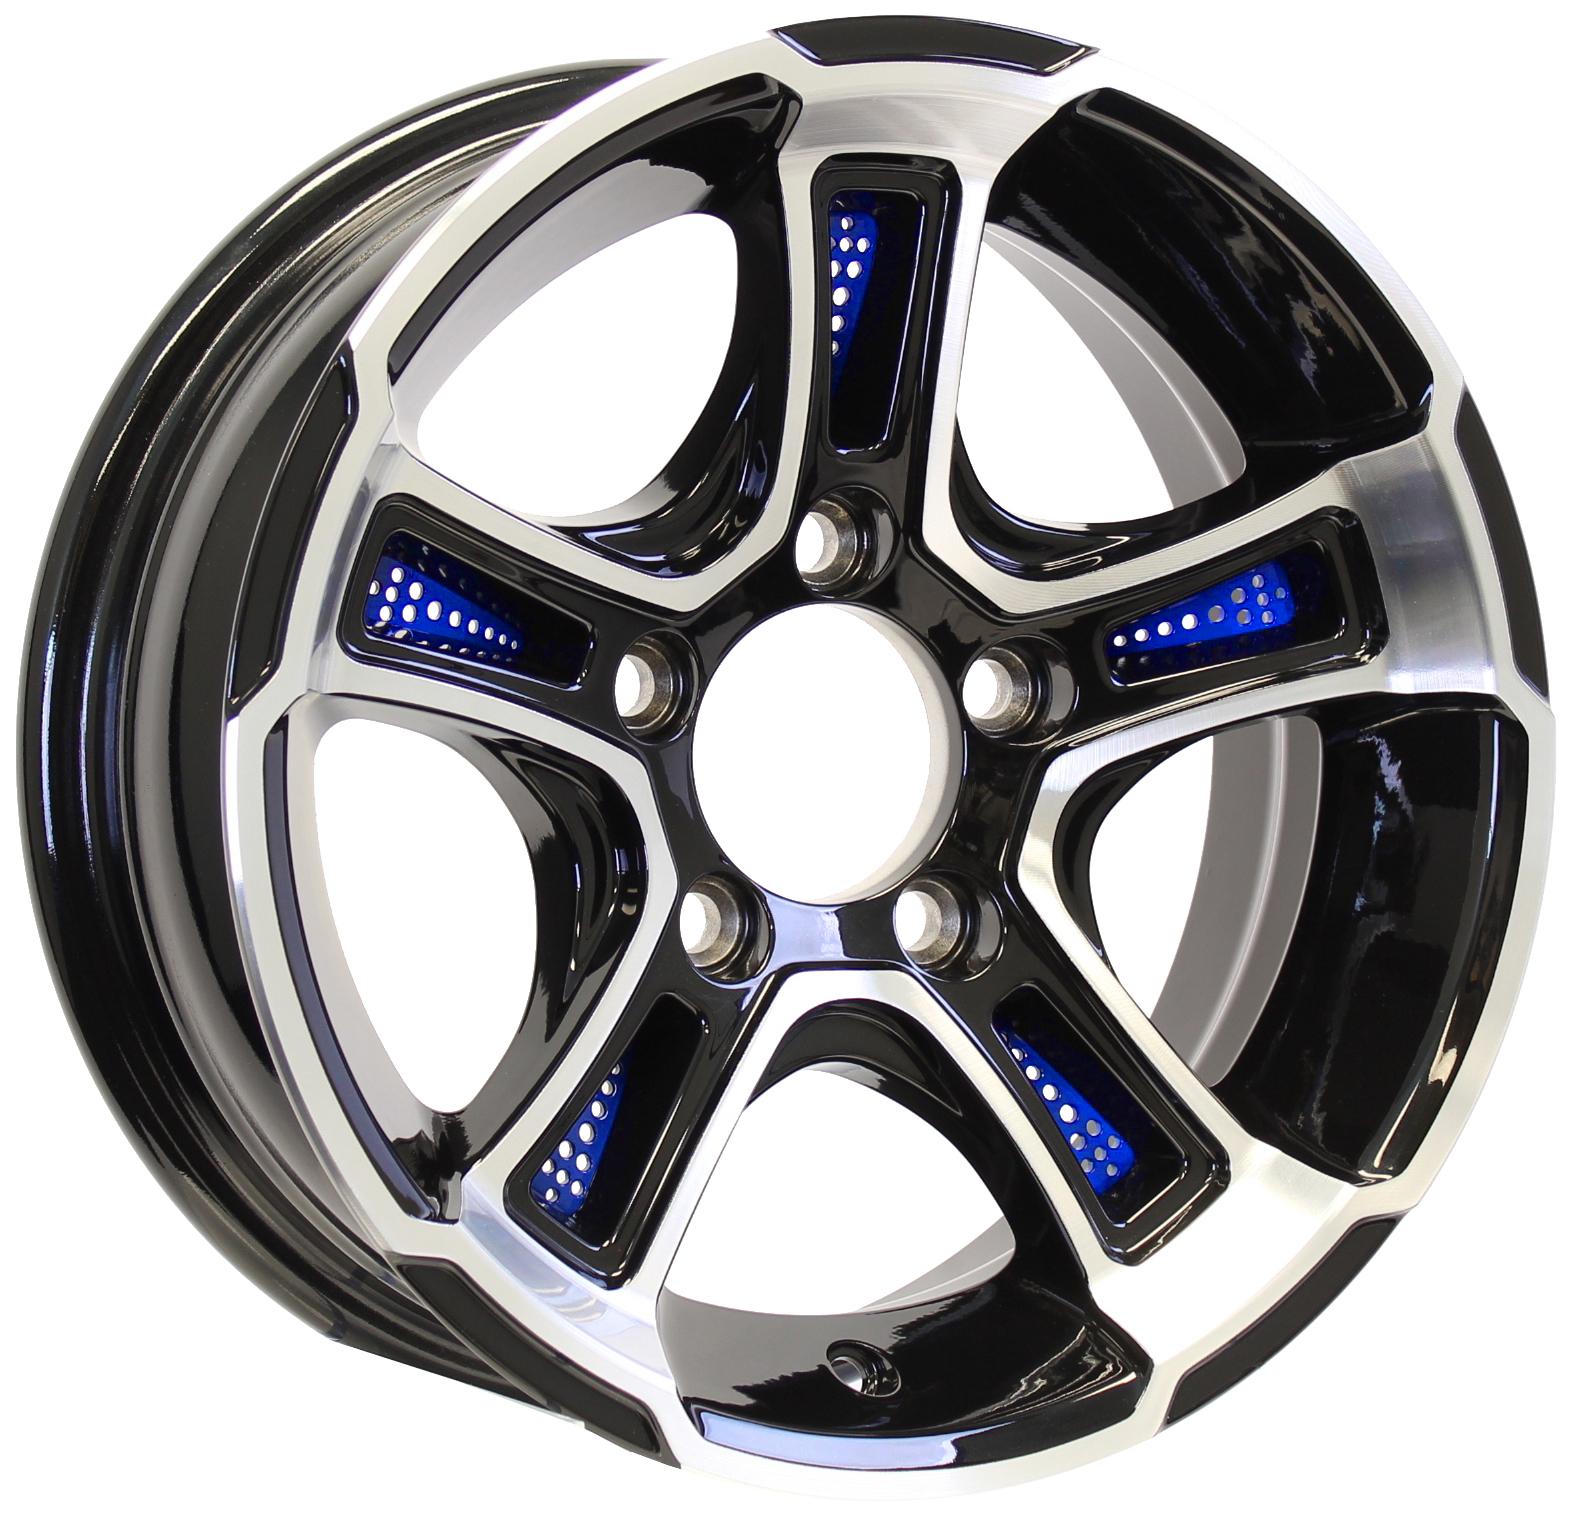 White Hawk 14x5.5 5-4.5 Black with Blue Inserts Aluminum Trailer Wheel Image